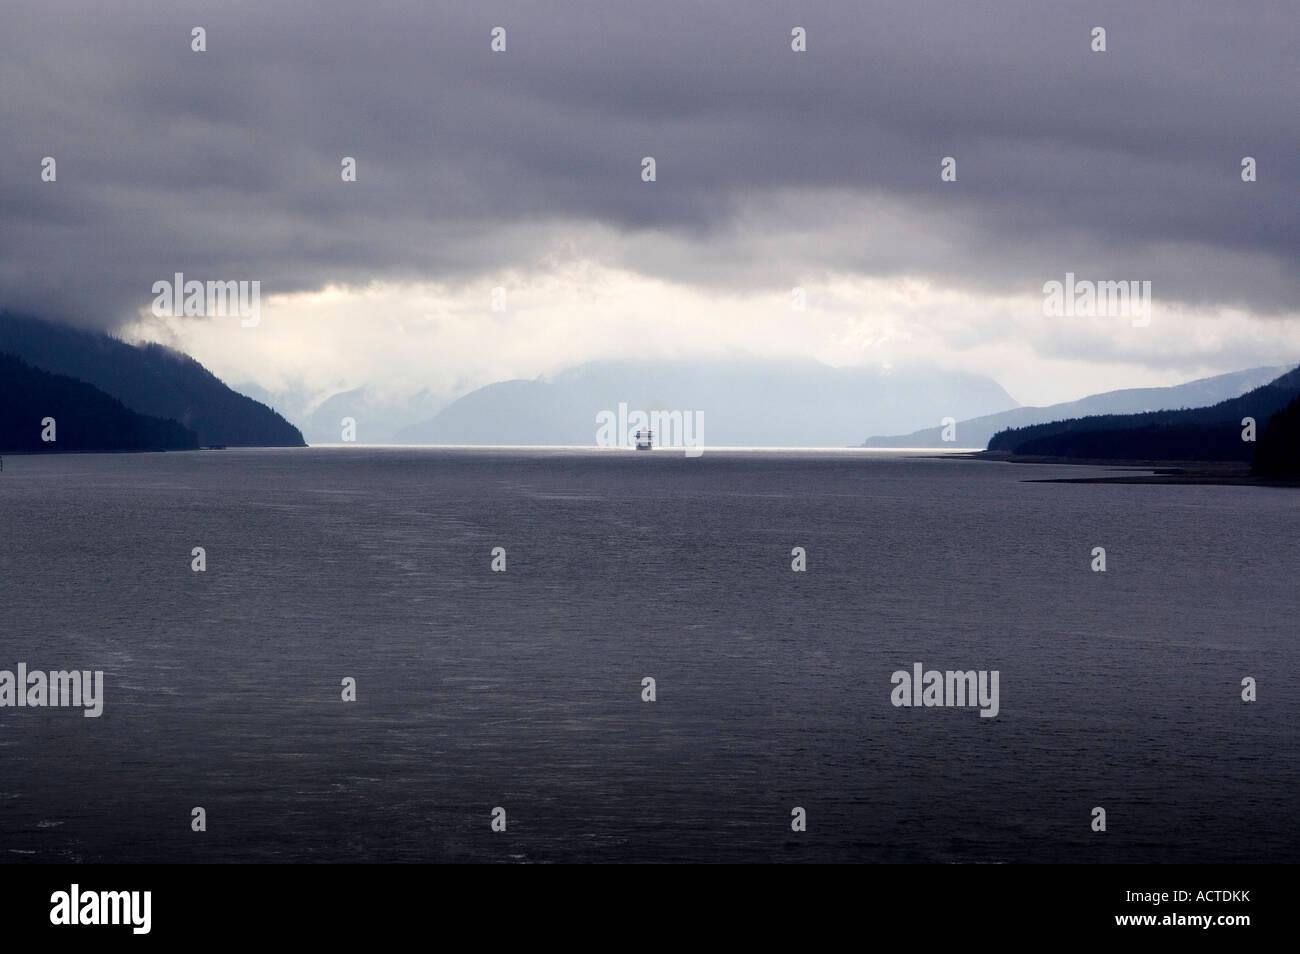 Cruise ship entering intercoastal passageway Alaska - Stock Image